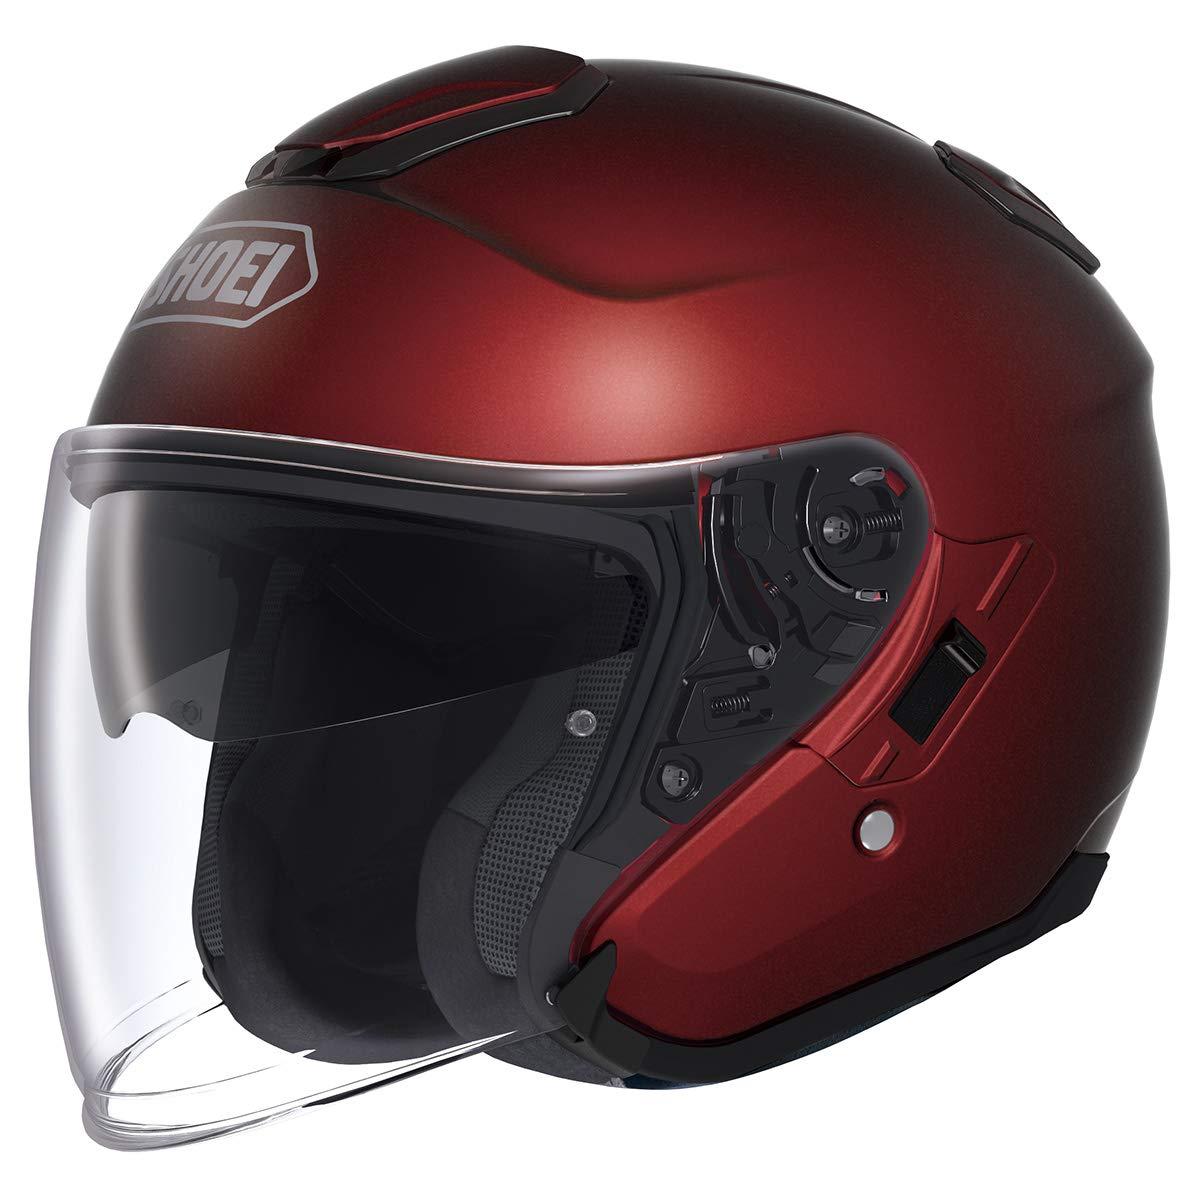 Amazon.com: Shoei j-cruise Reborn casco, XL, Tc-1: Automotive